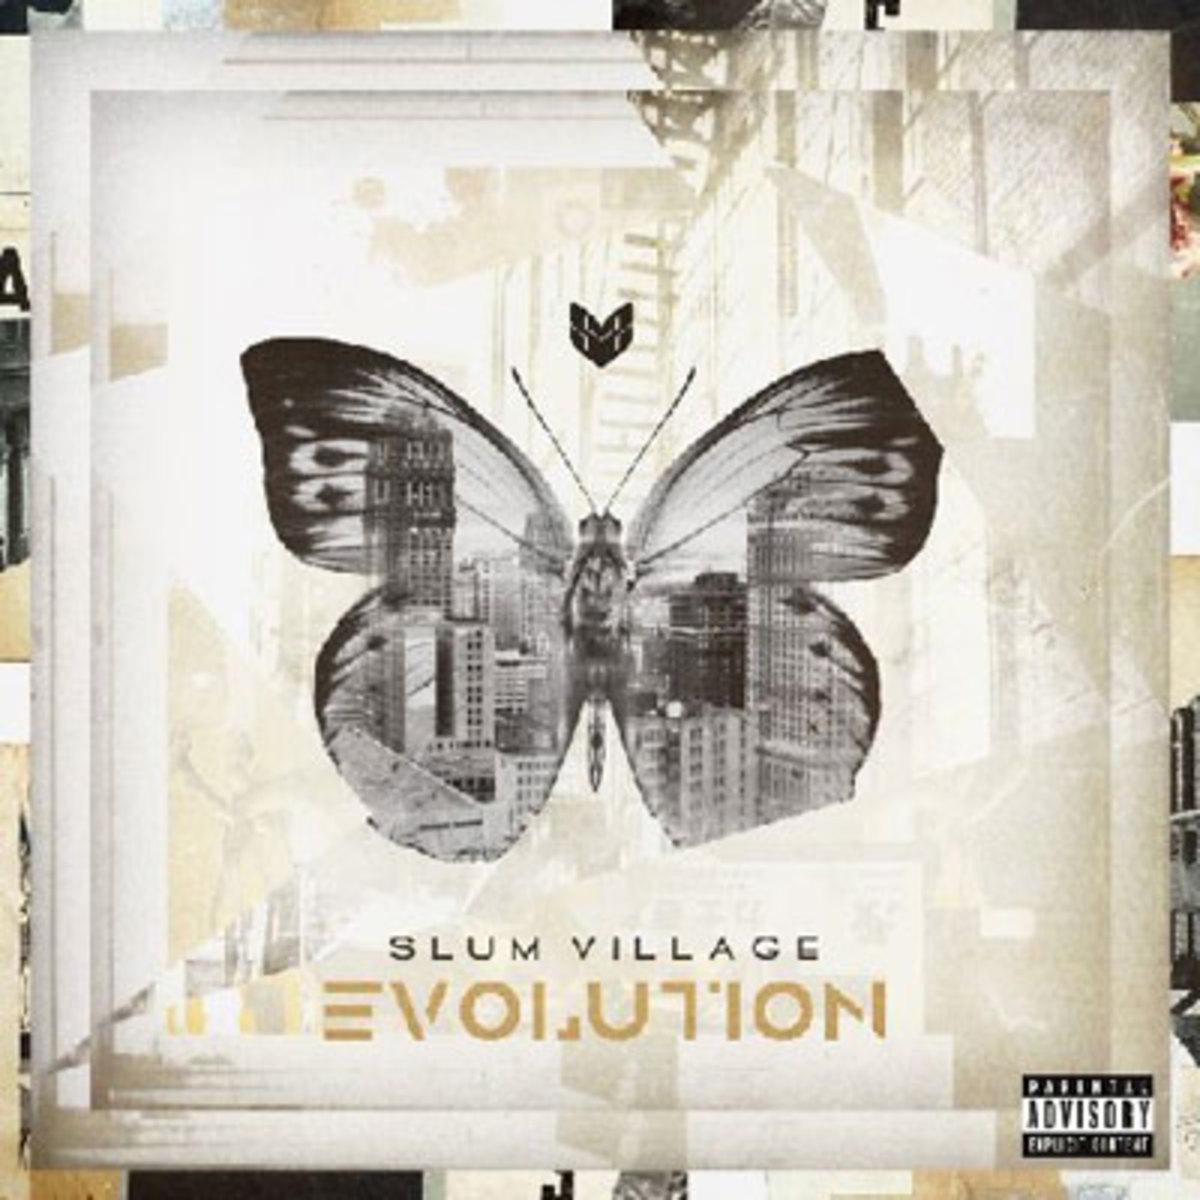 slumvillage-evolution.jpg